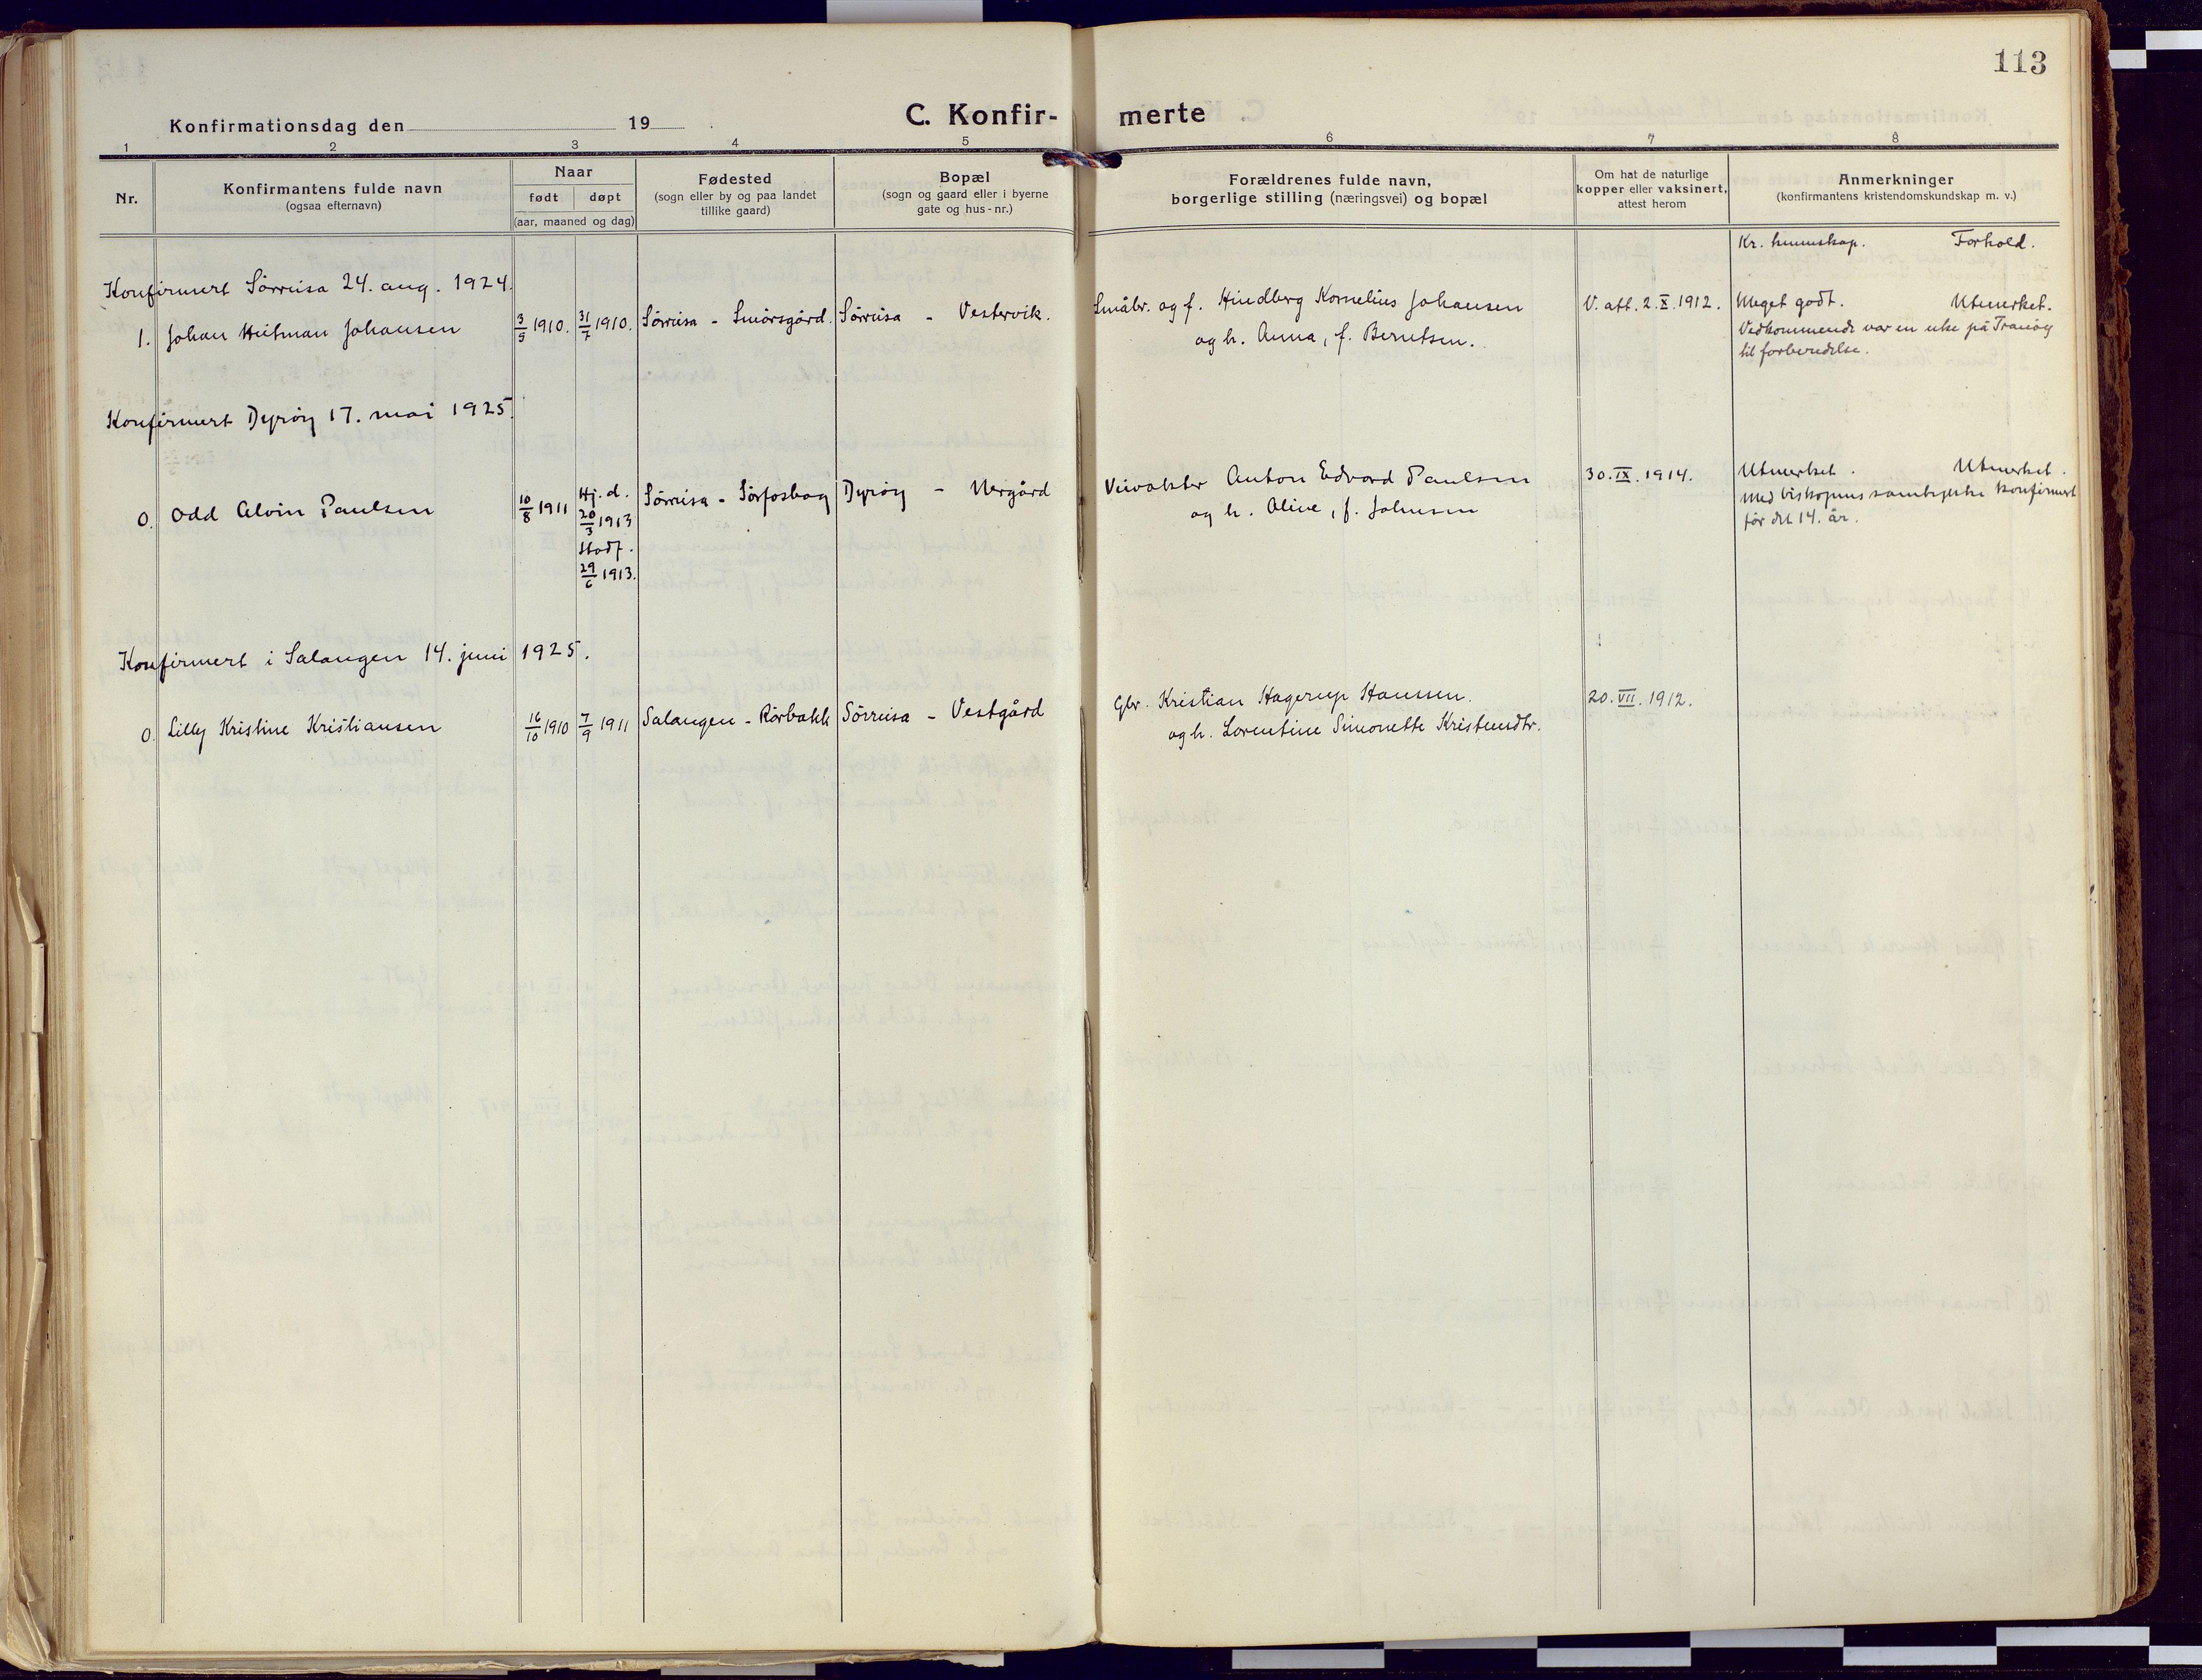 SATØ, Tranøy sokneprestkontor, I/Ia/Iaa/L0015kirke: Ministerialbok nr. 15, 1919-1928, s. 113